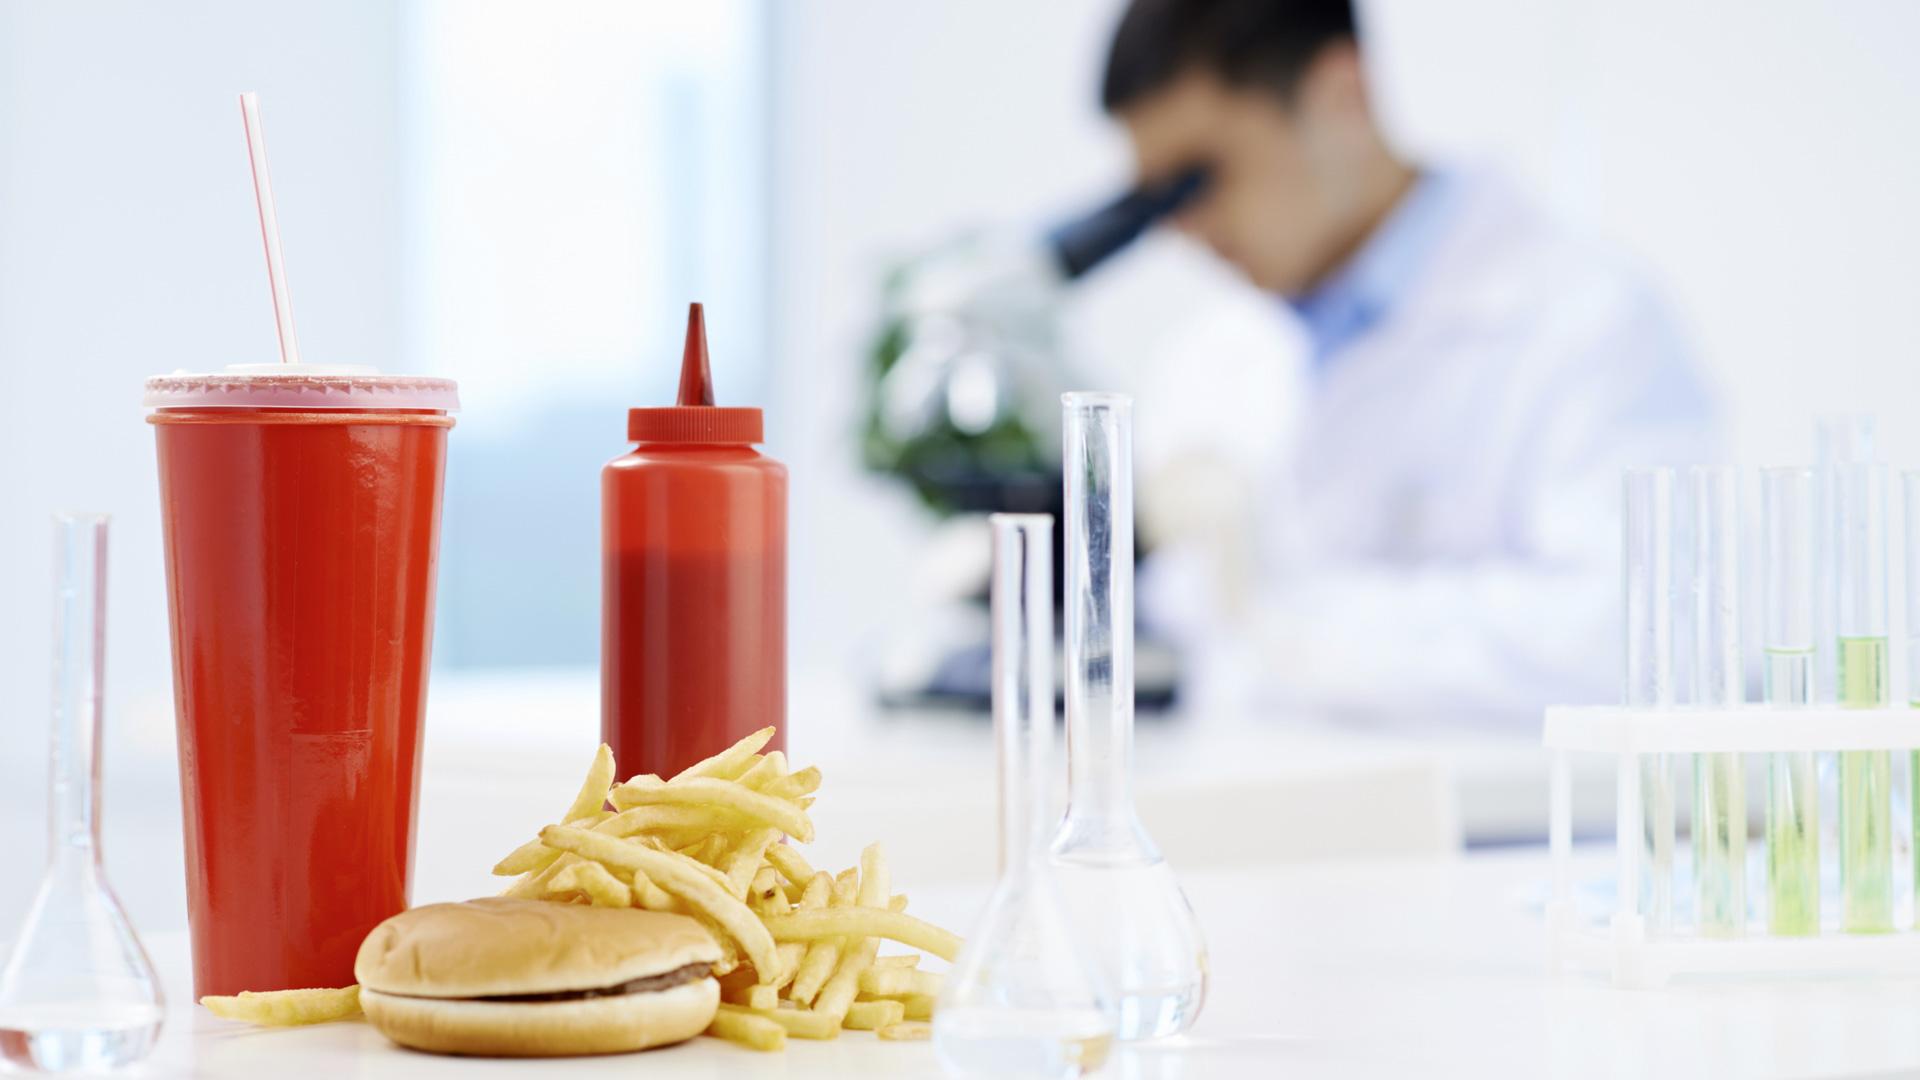 Cloning your next hamburger